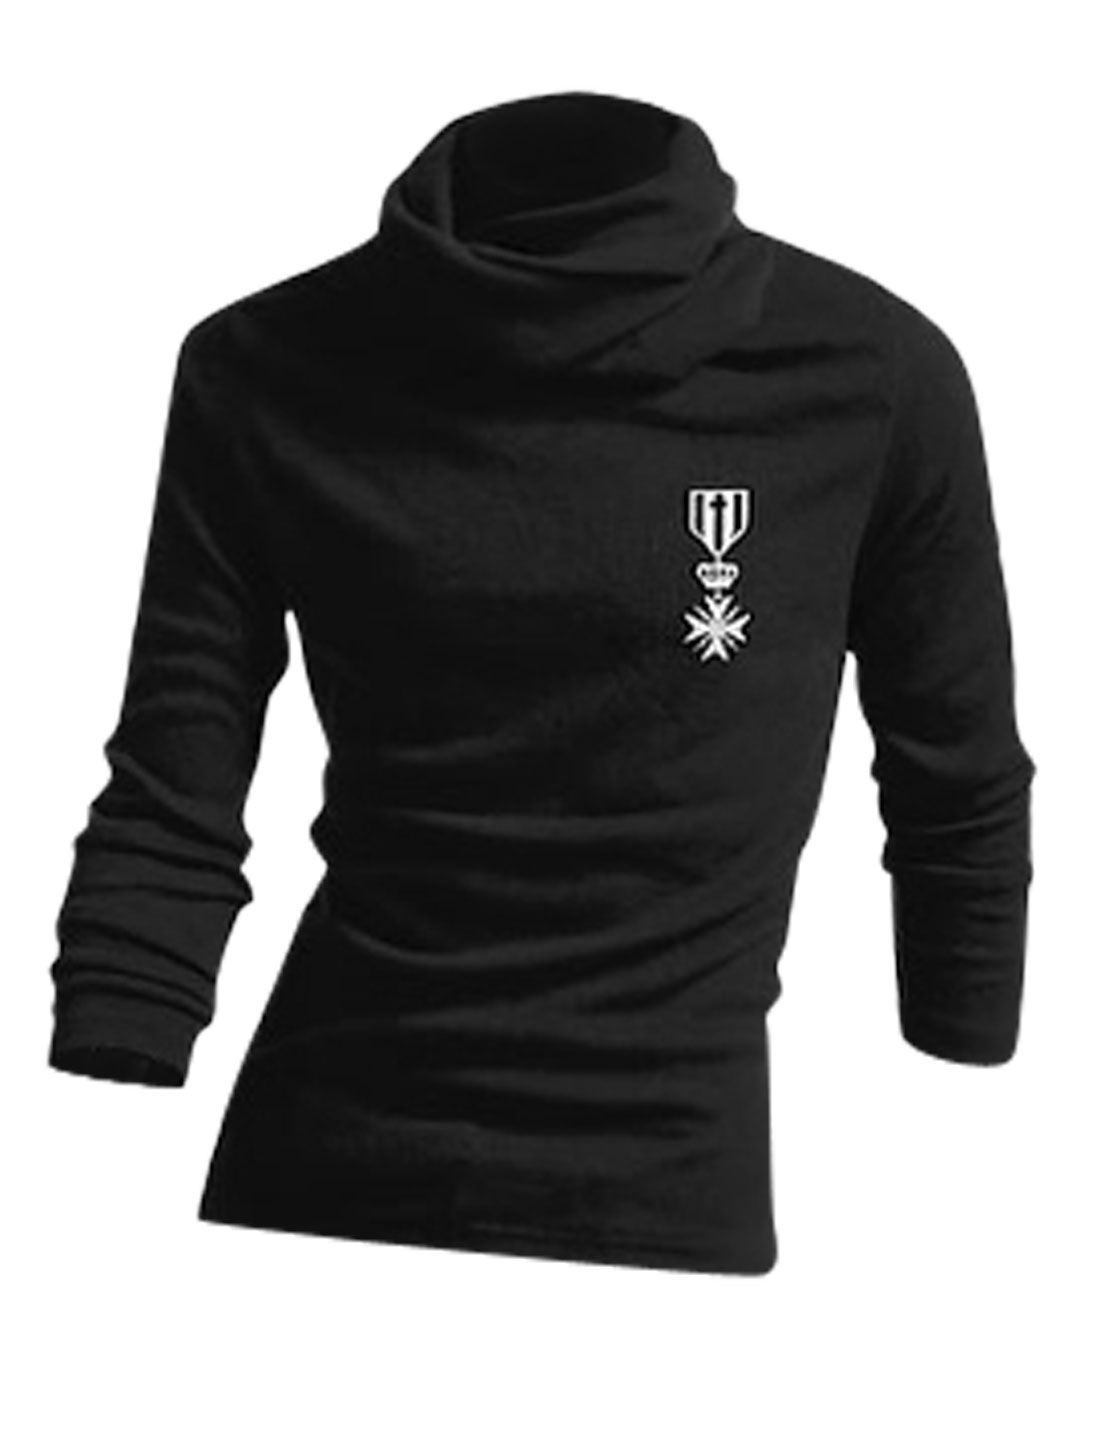 Men Cowl Neck Medal Printed Casual Top Shirt Black M